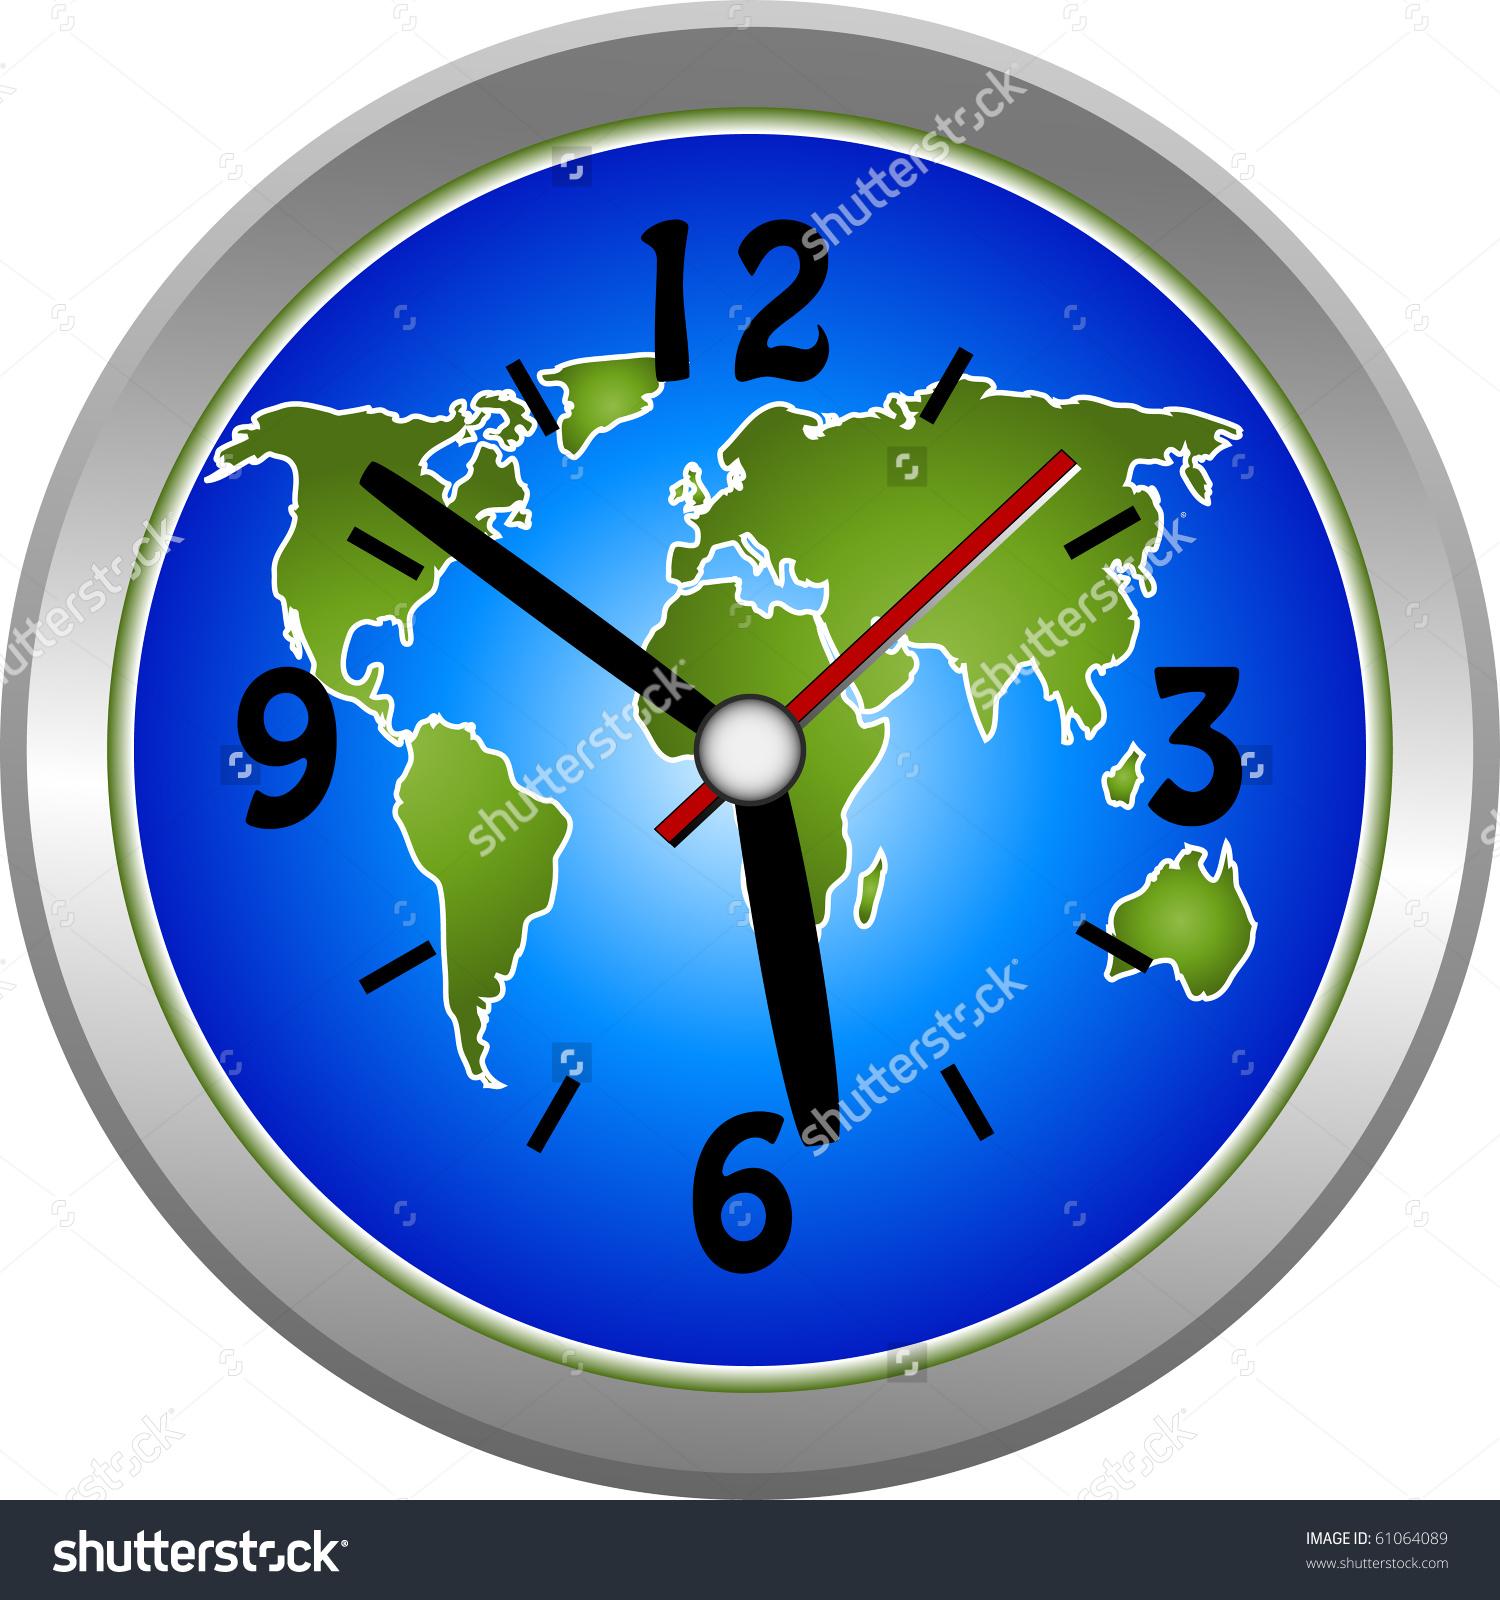 Globe World Clock Illustration Stock Illustration 61064089.